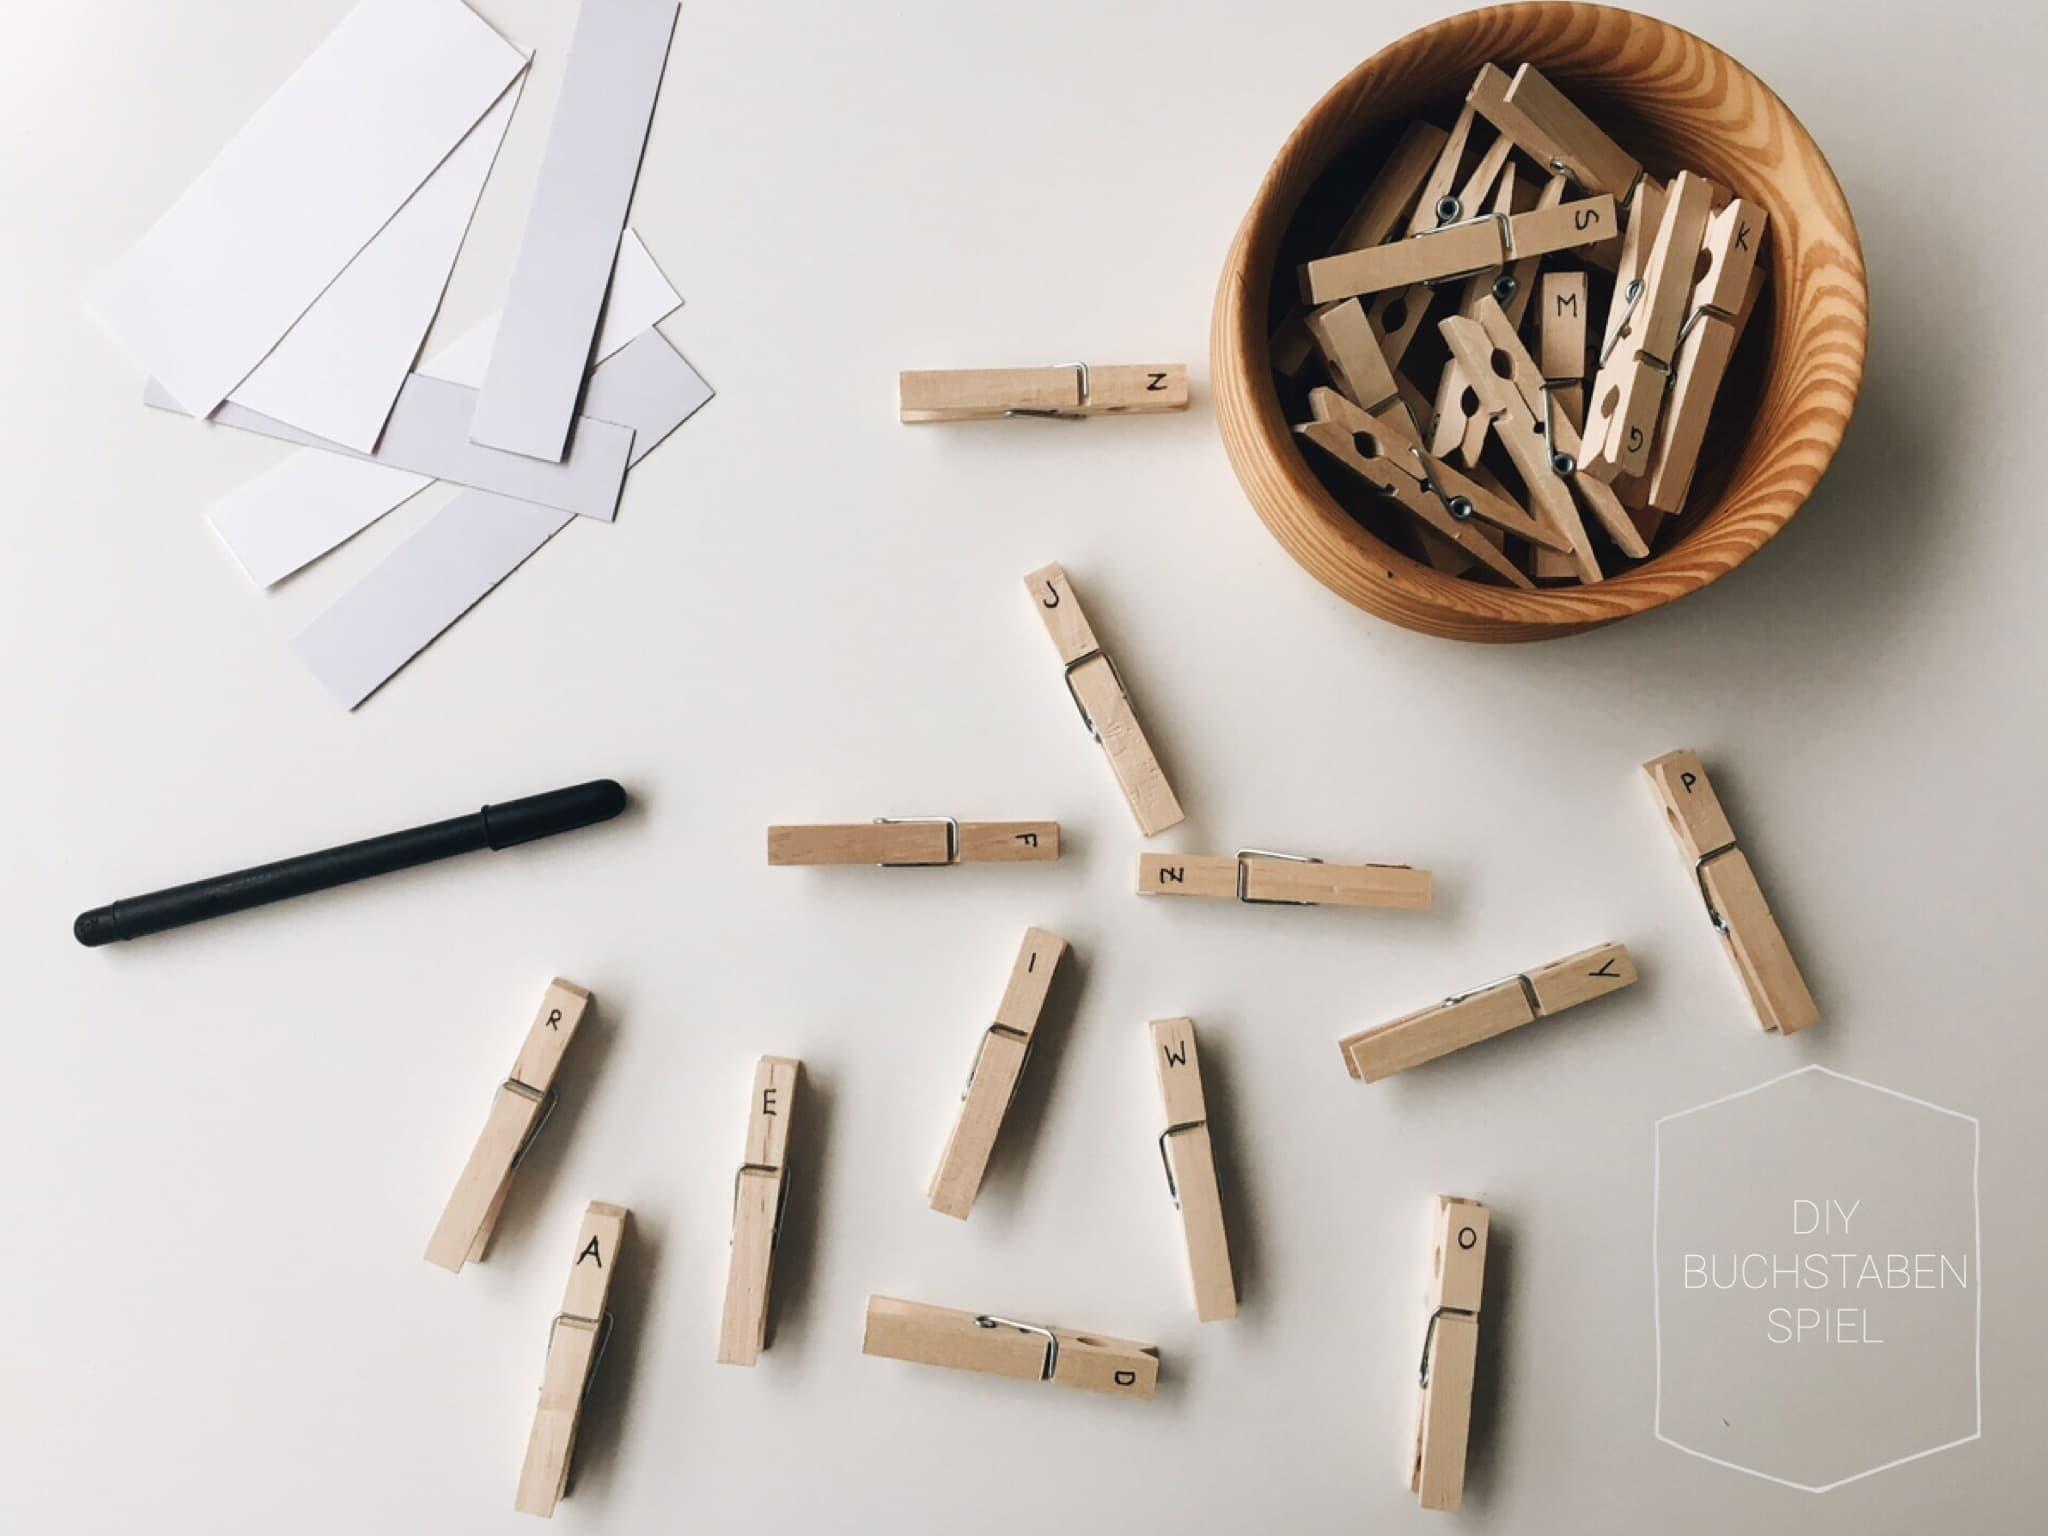 DIY-Buchstabelspiel 4